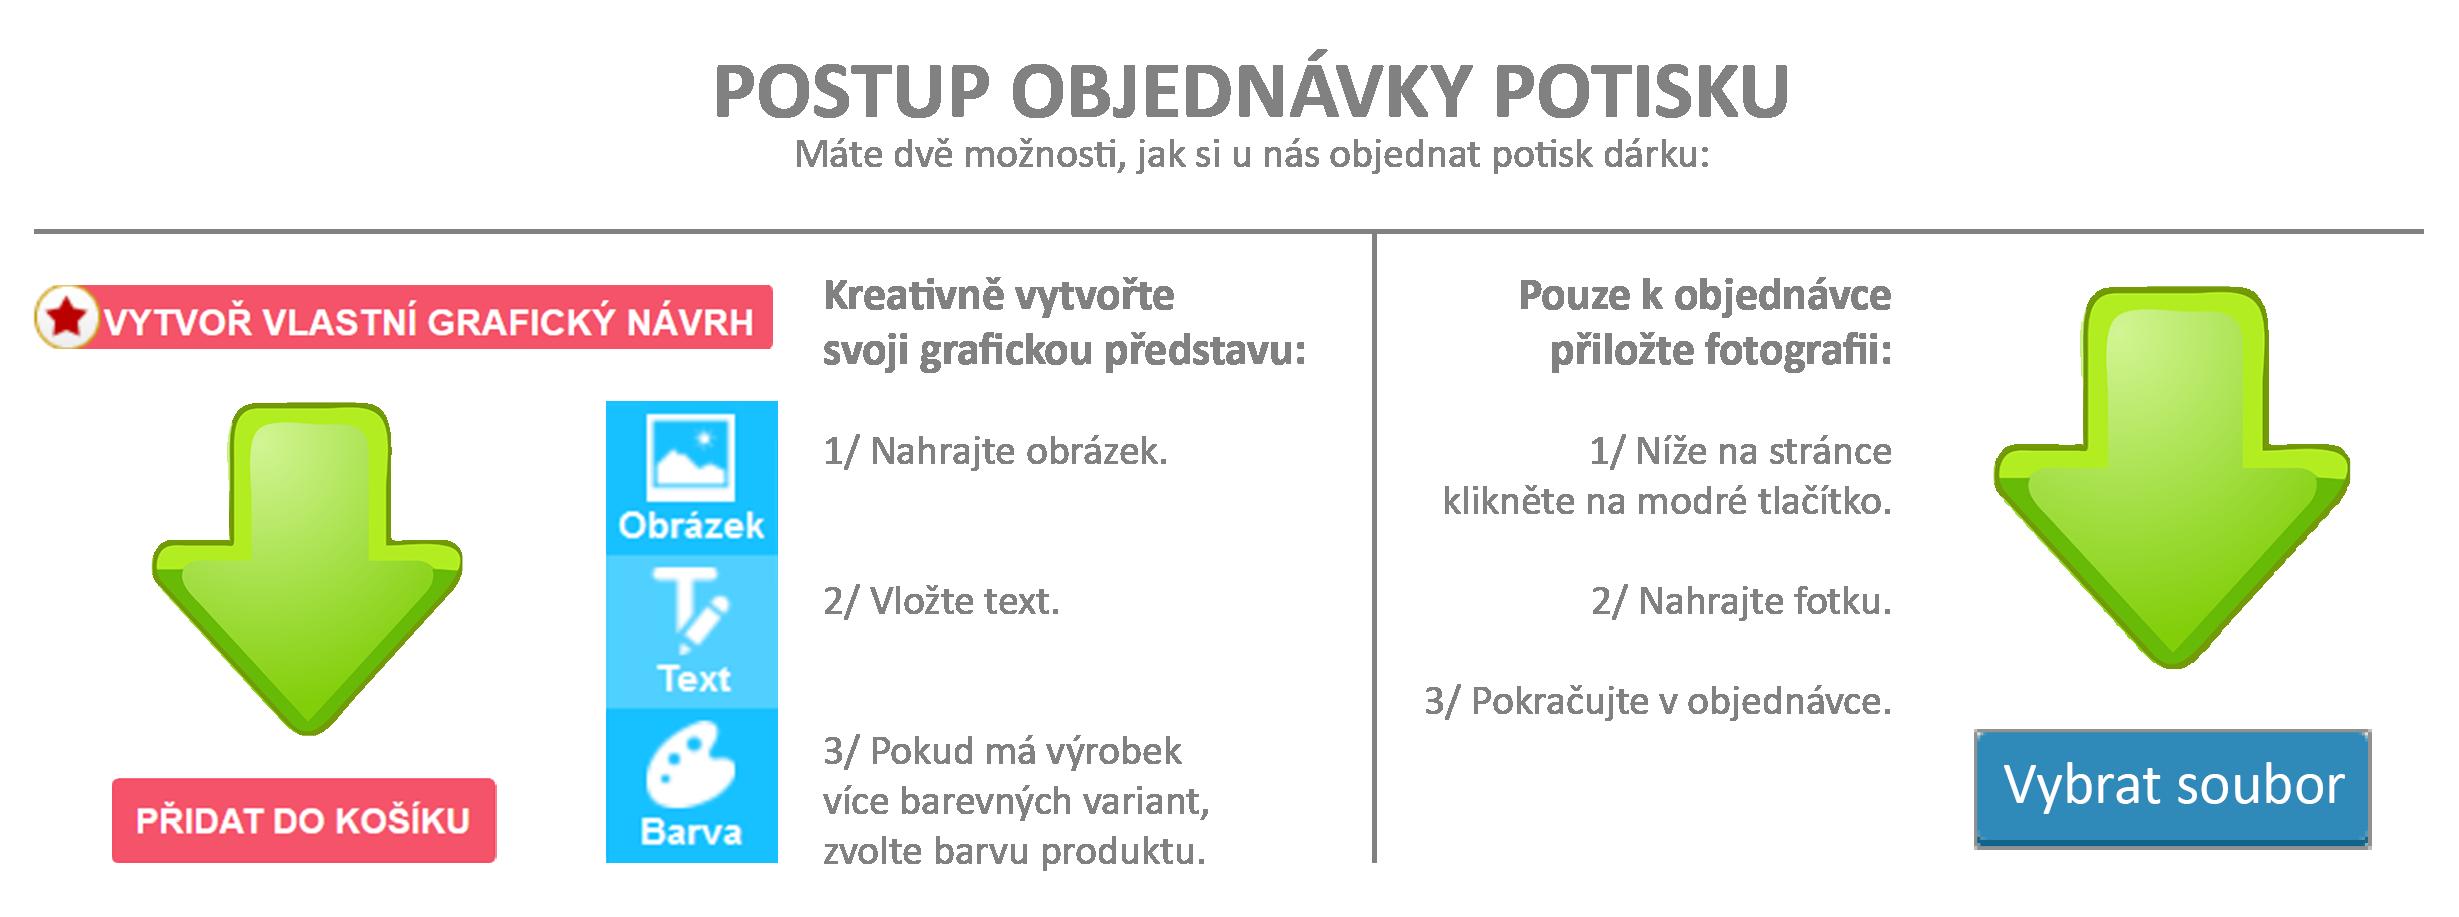 navod_objednani